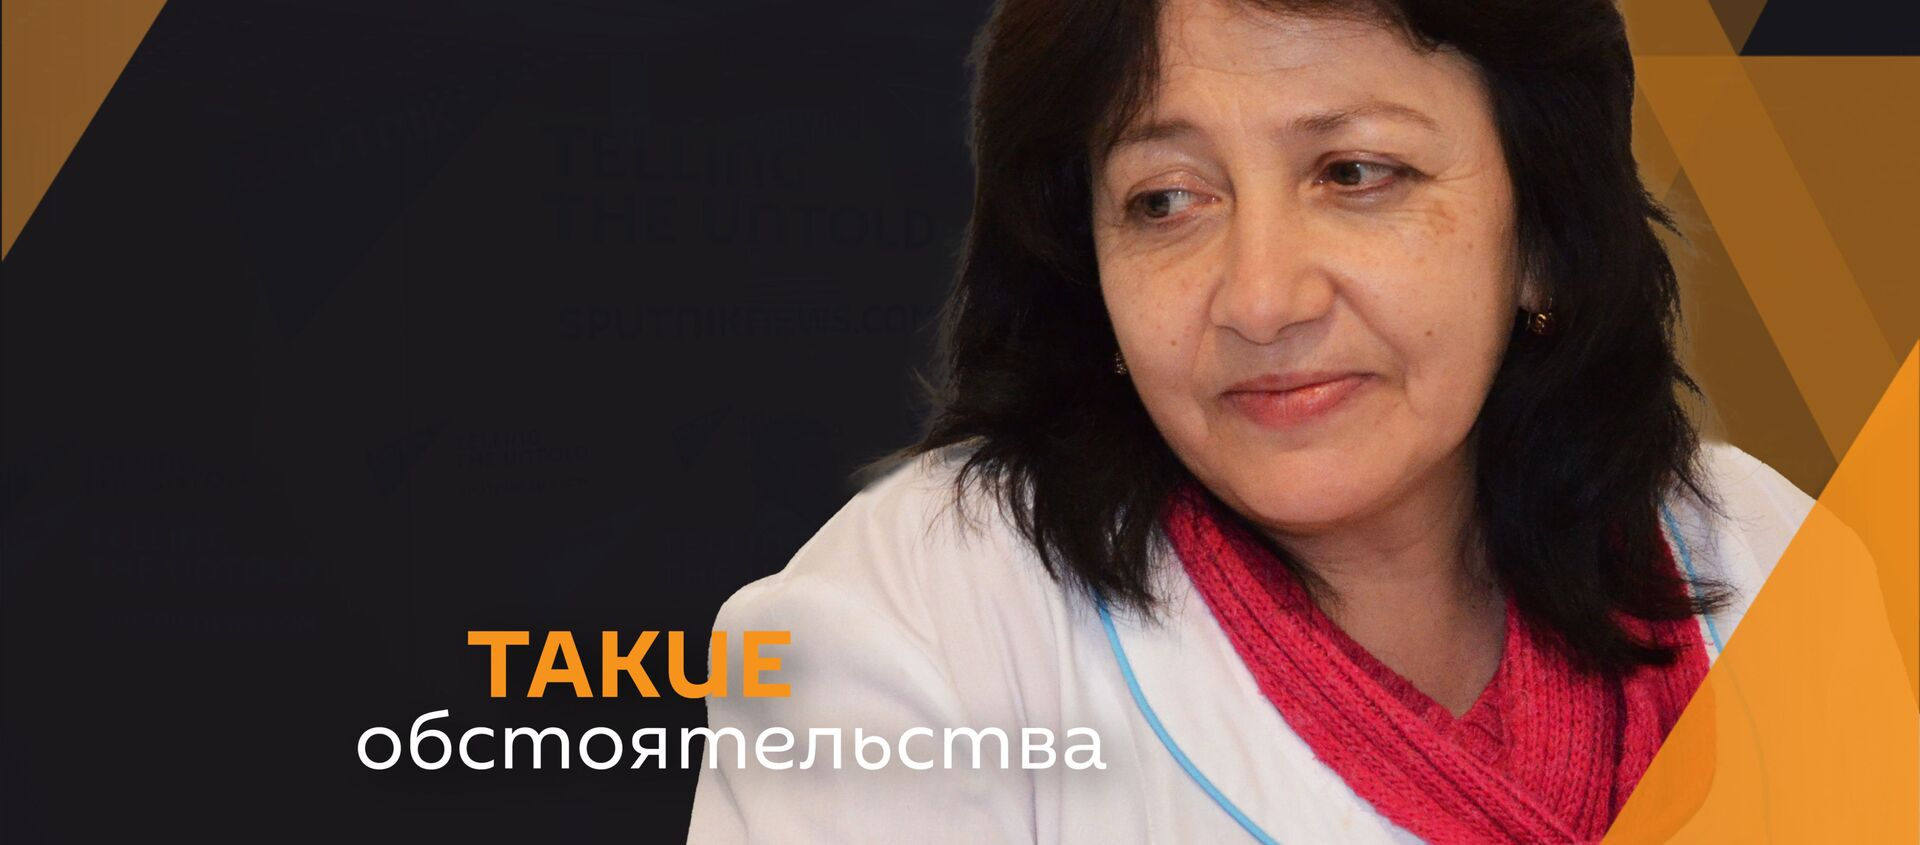 Марина Маркова - Sputnik Абхазия, 1920, 24.03.2021